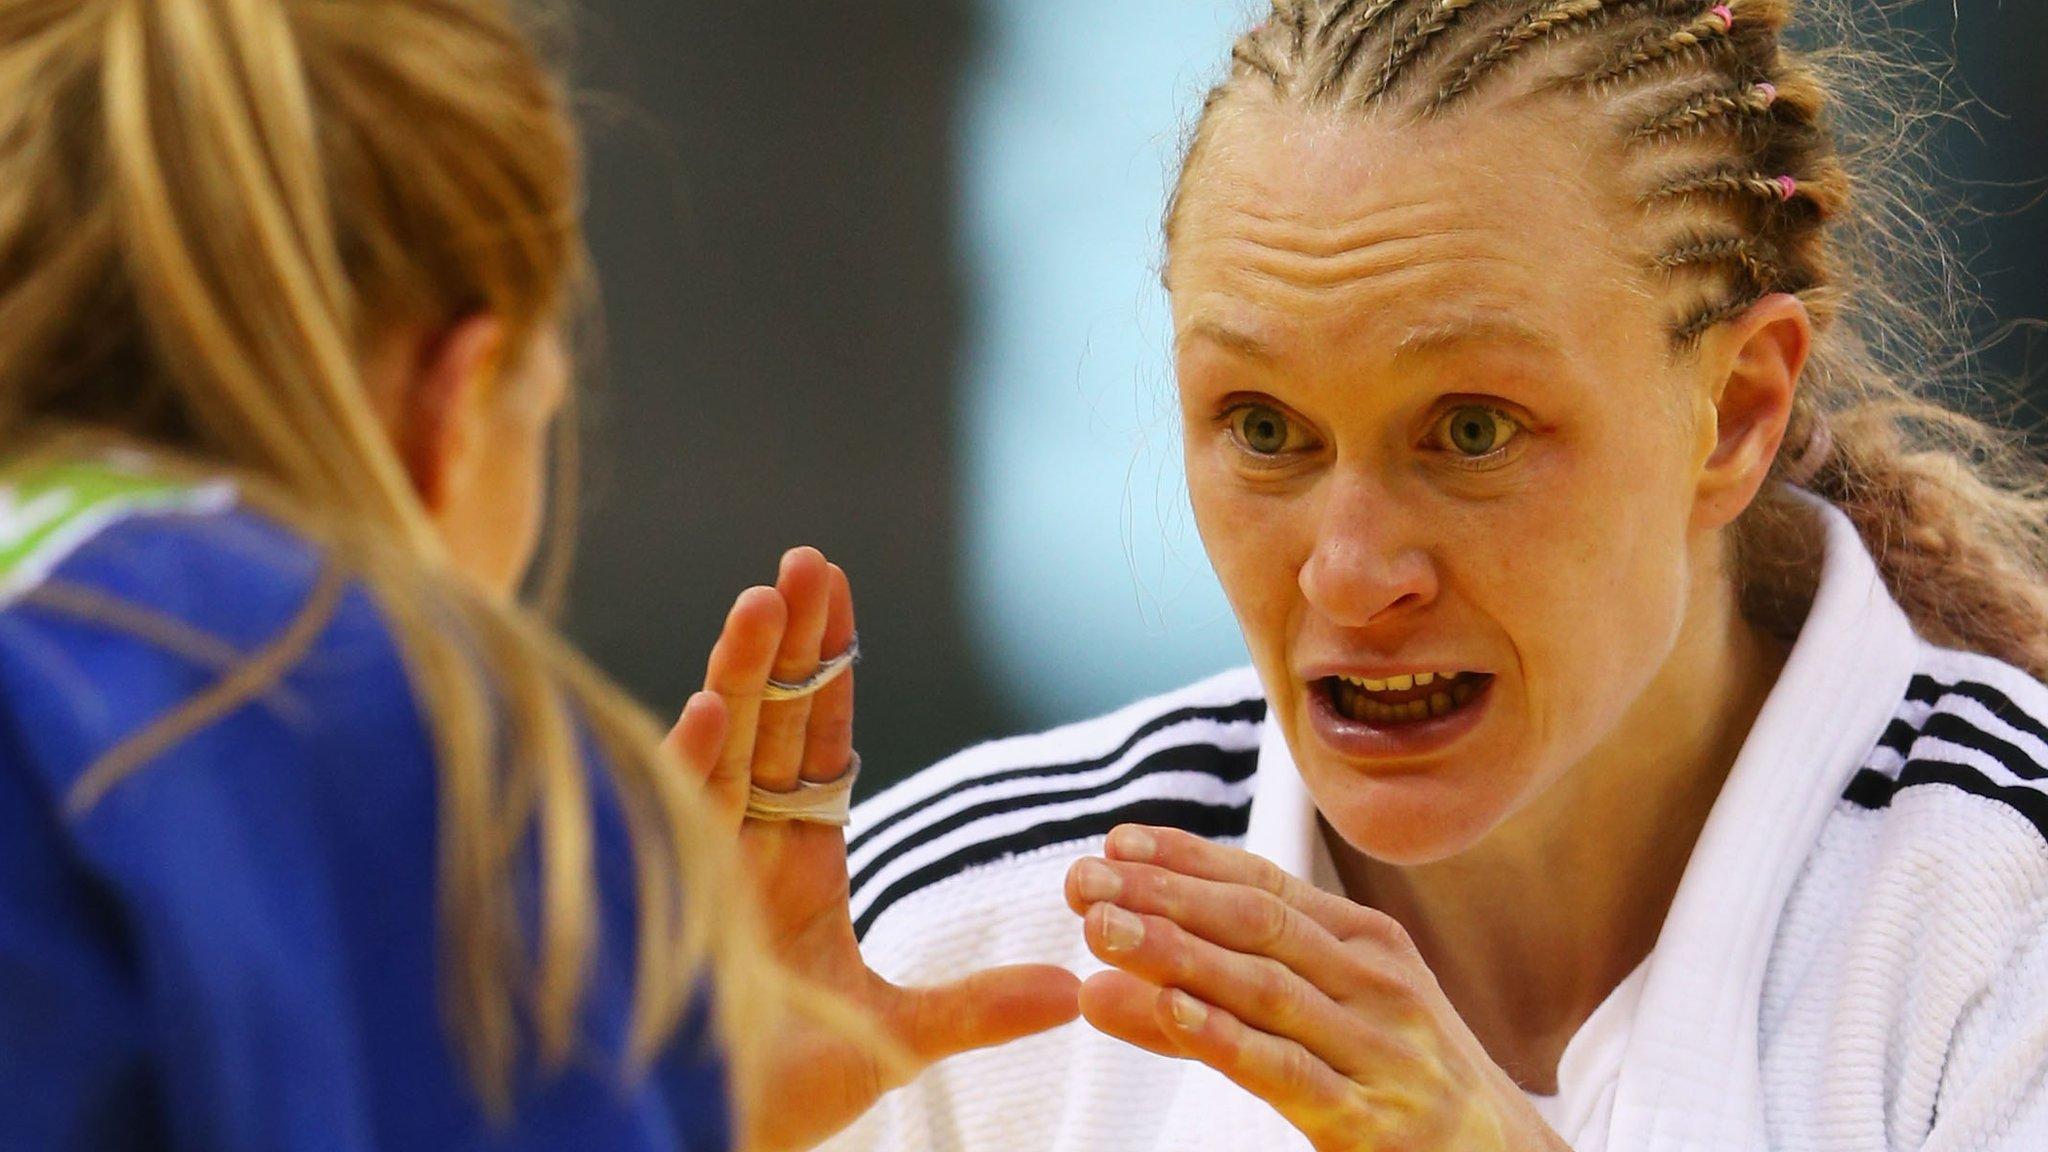 Gemma Howell: Great Britain judoka wins Grand Prix bronze medal in China